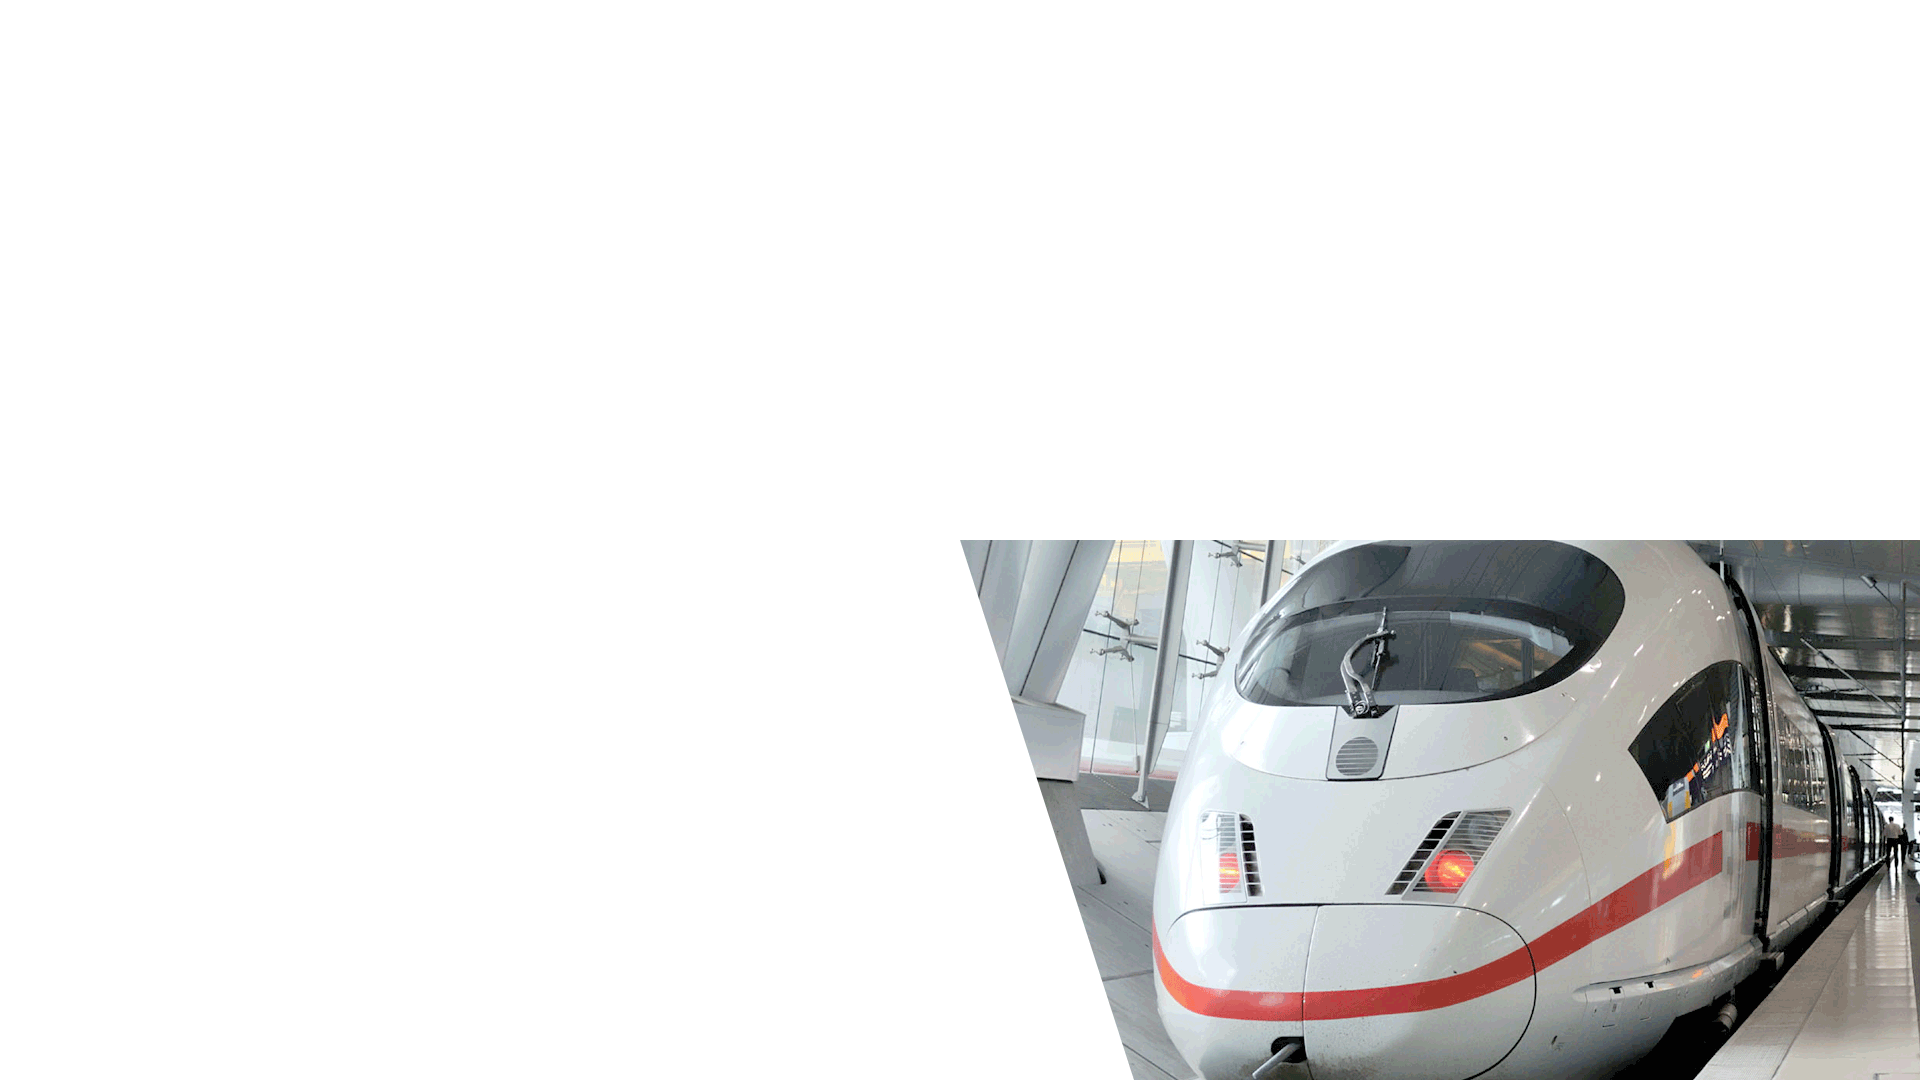 Transport Displays Market